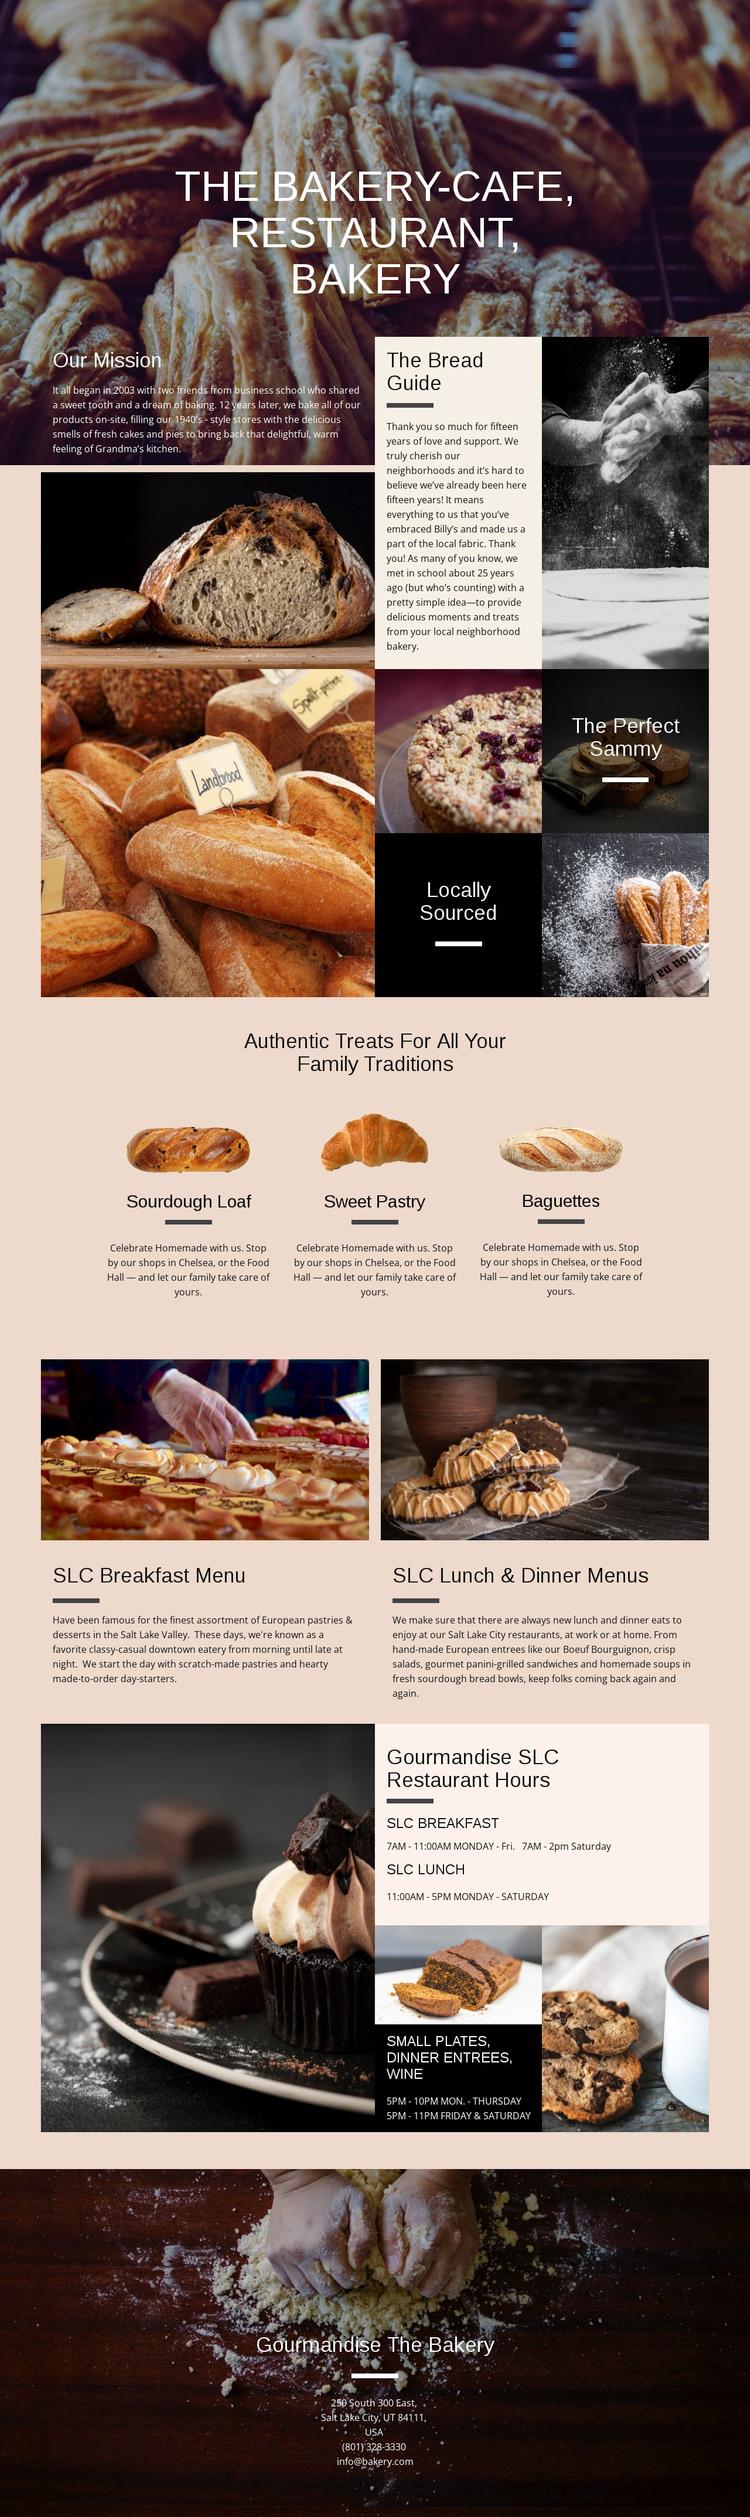 The Bakery Website Builder Software